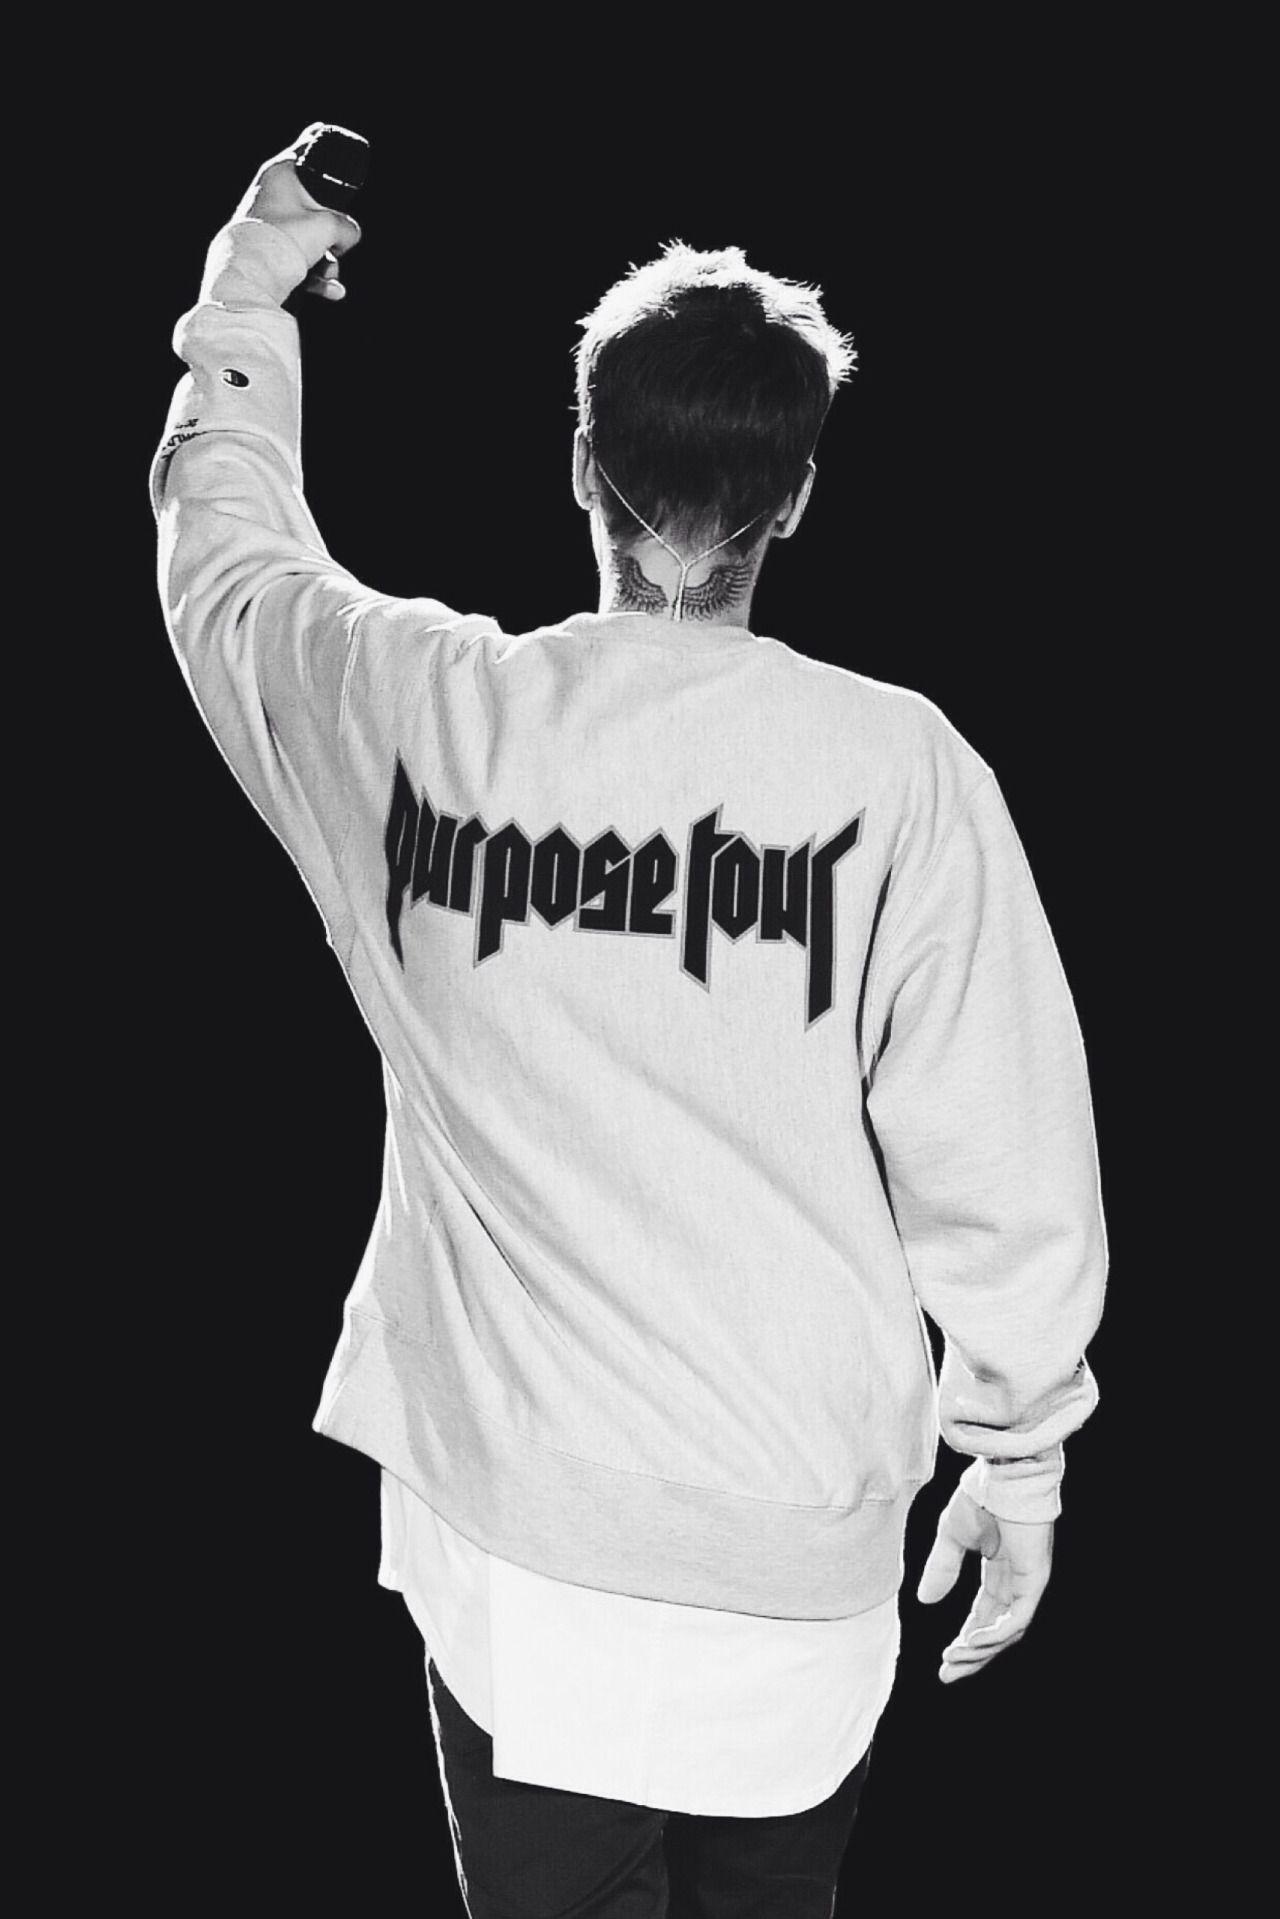 Justin Bieber Justin Bieber Wallpaper Justin Bieber Pictures Justin Bieber